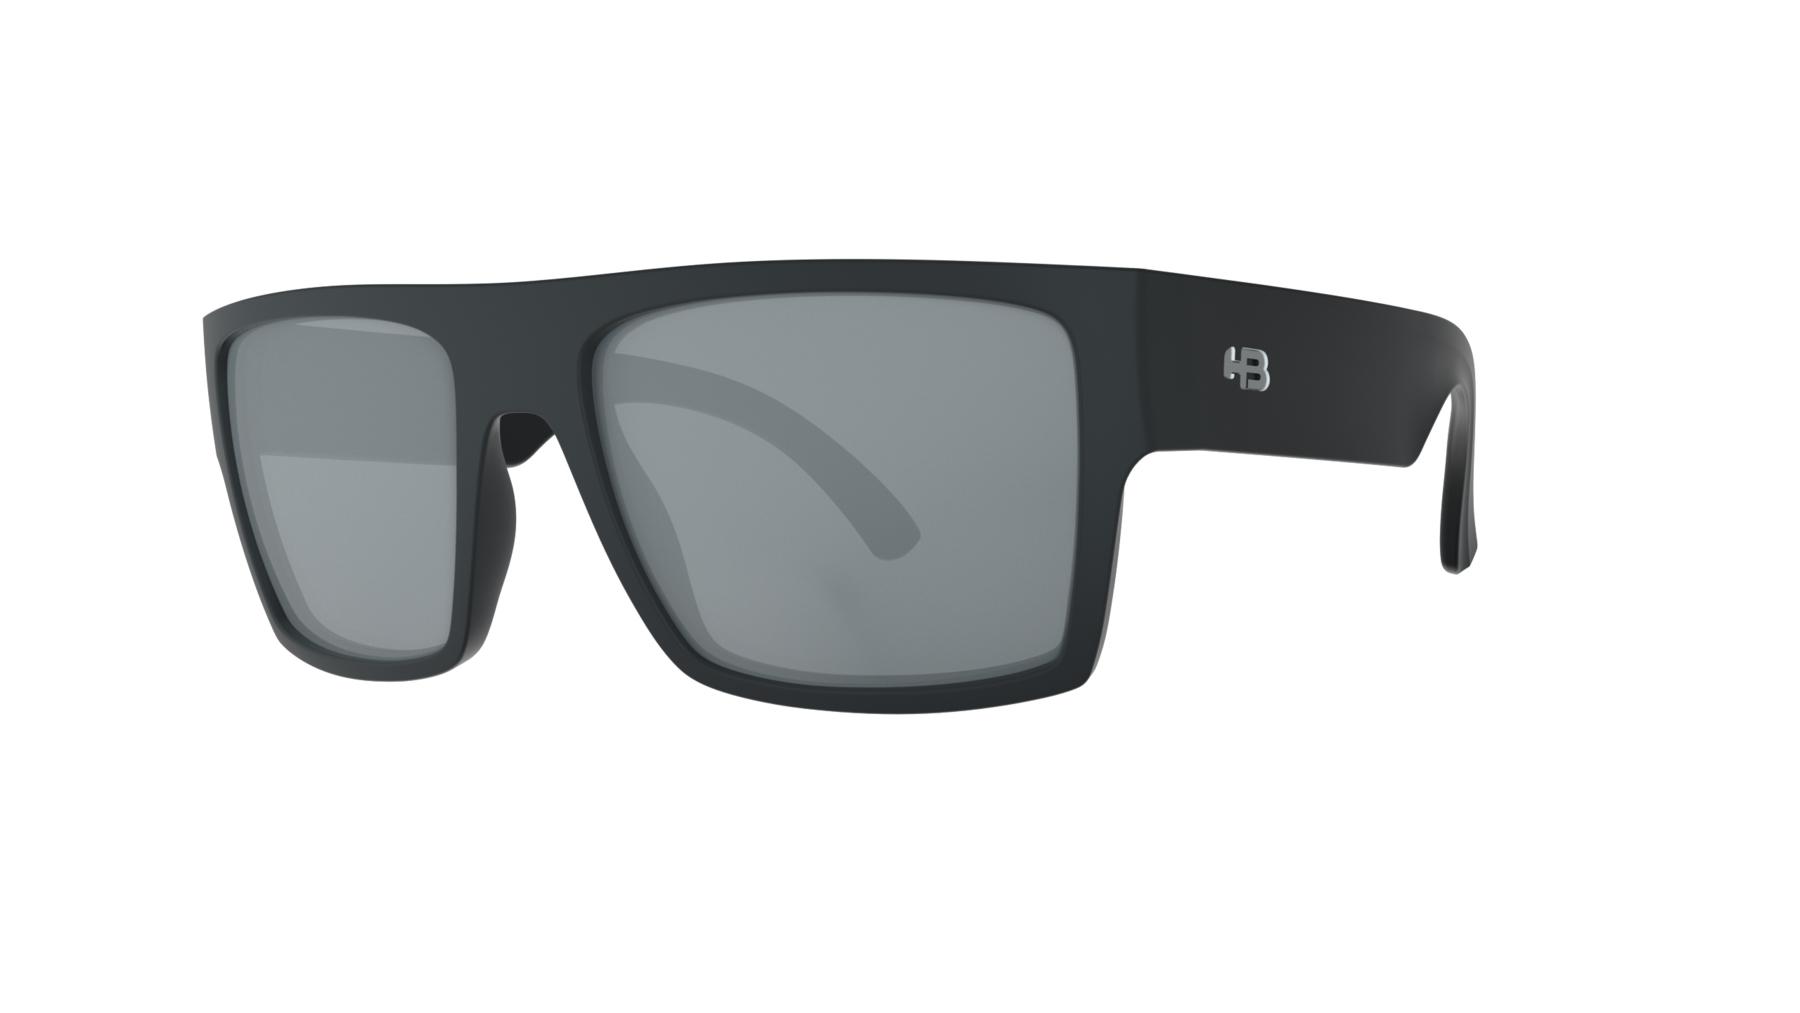 Óculos HB Loud Matte Black Gray